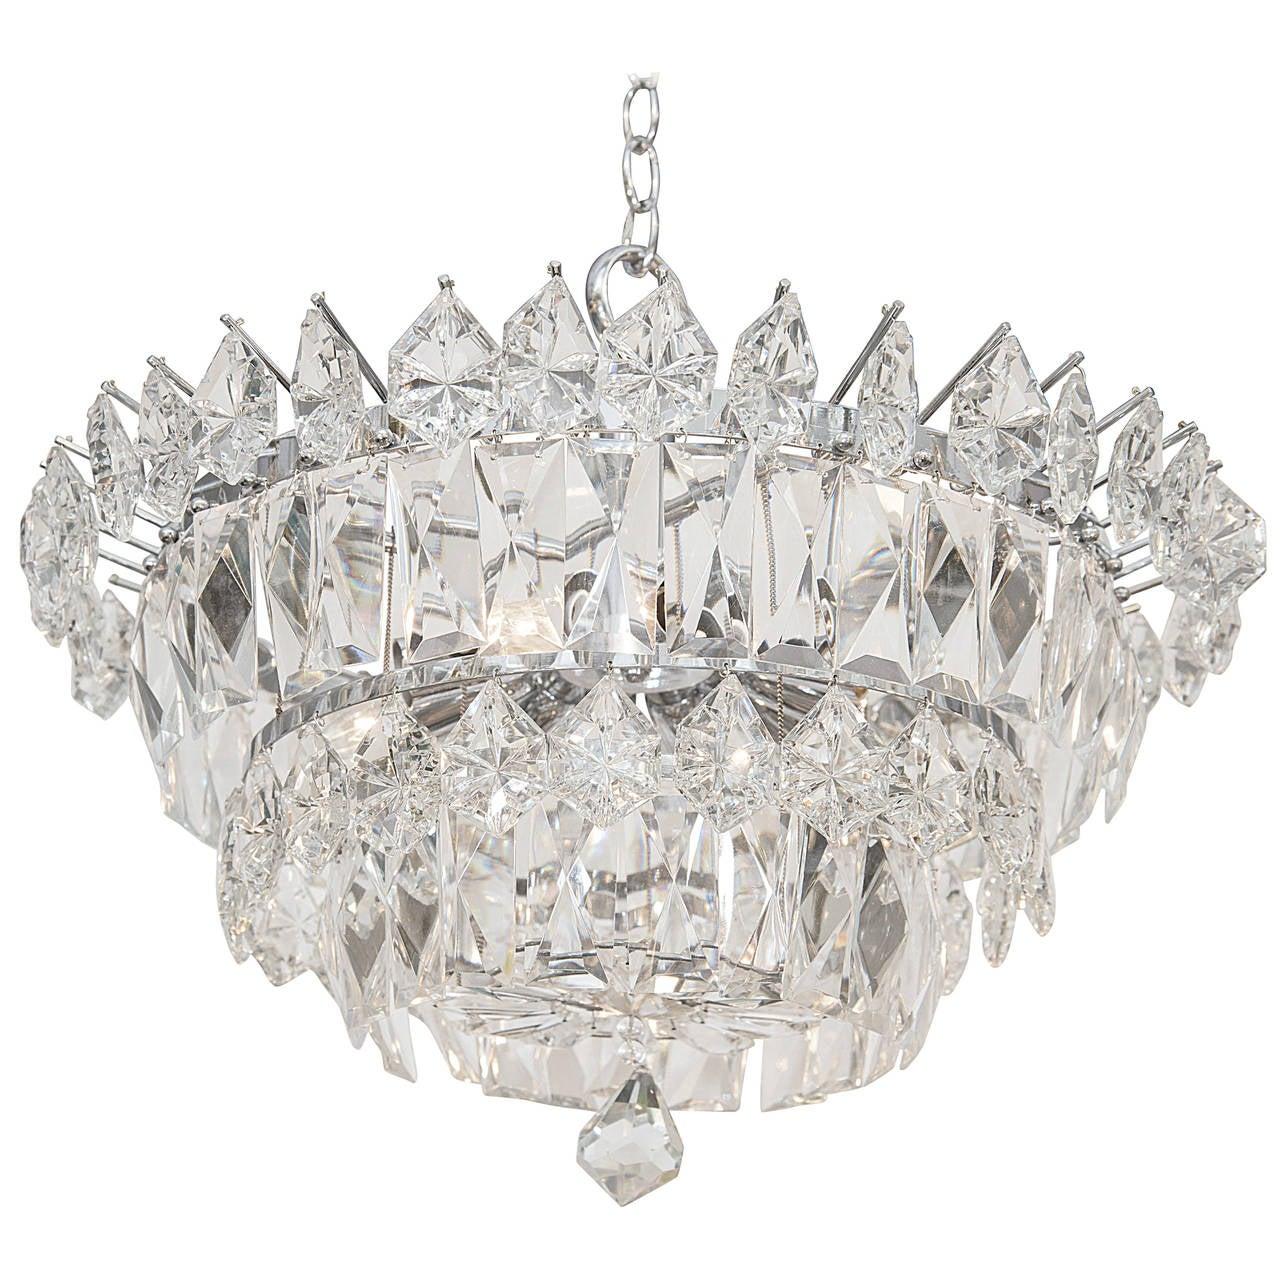 Italian Midcentury Murano Cut Crystal Chandelier